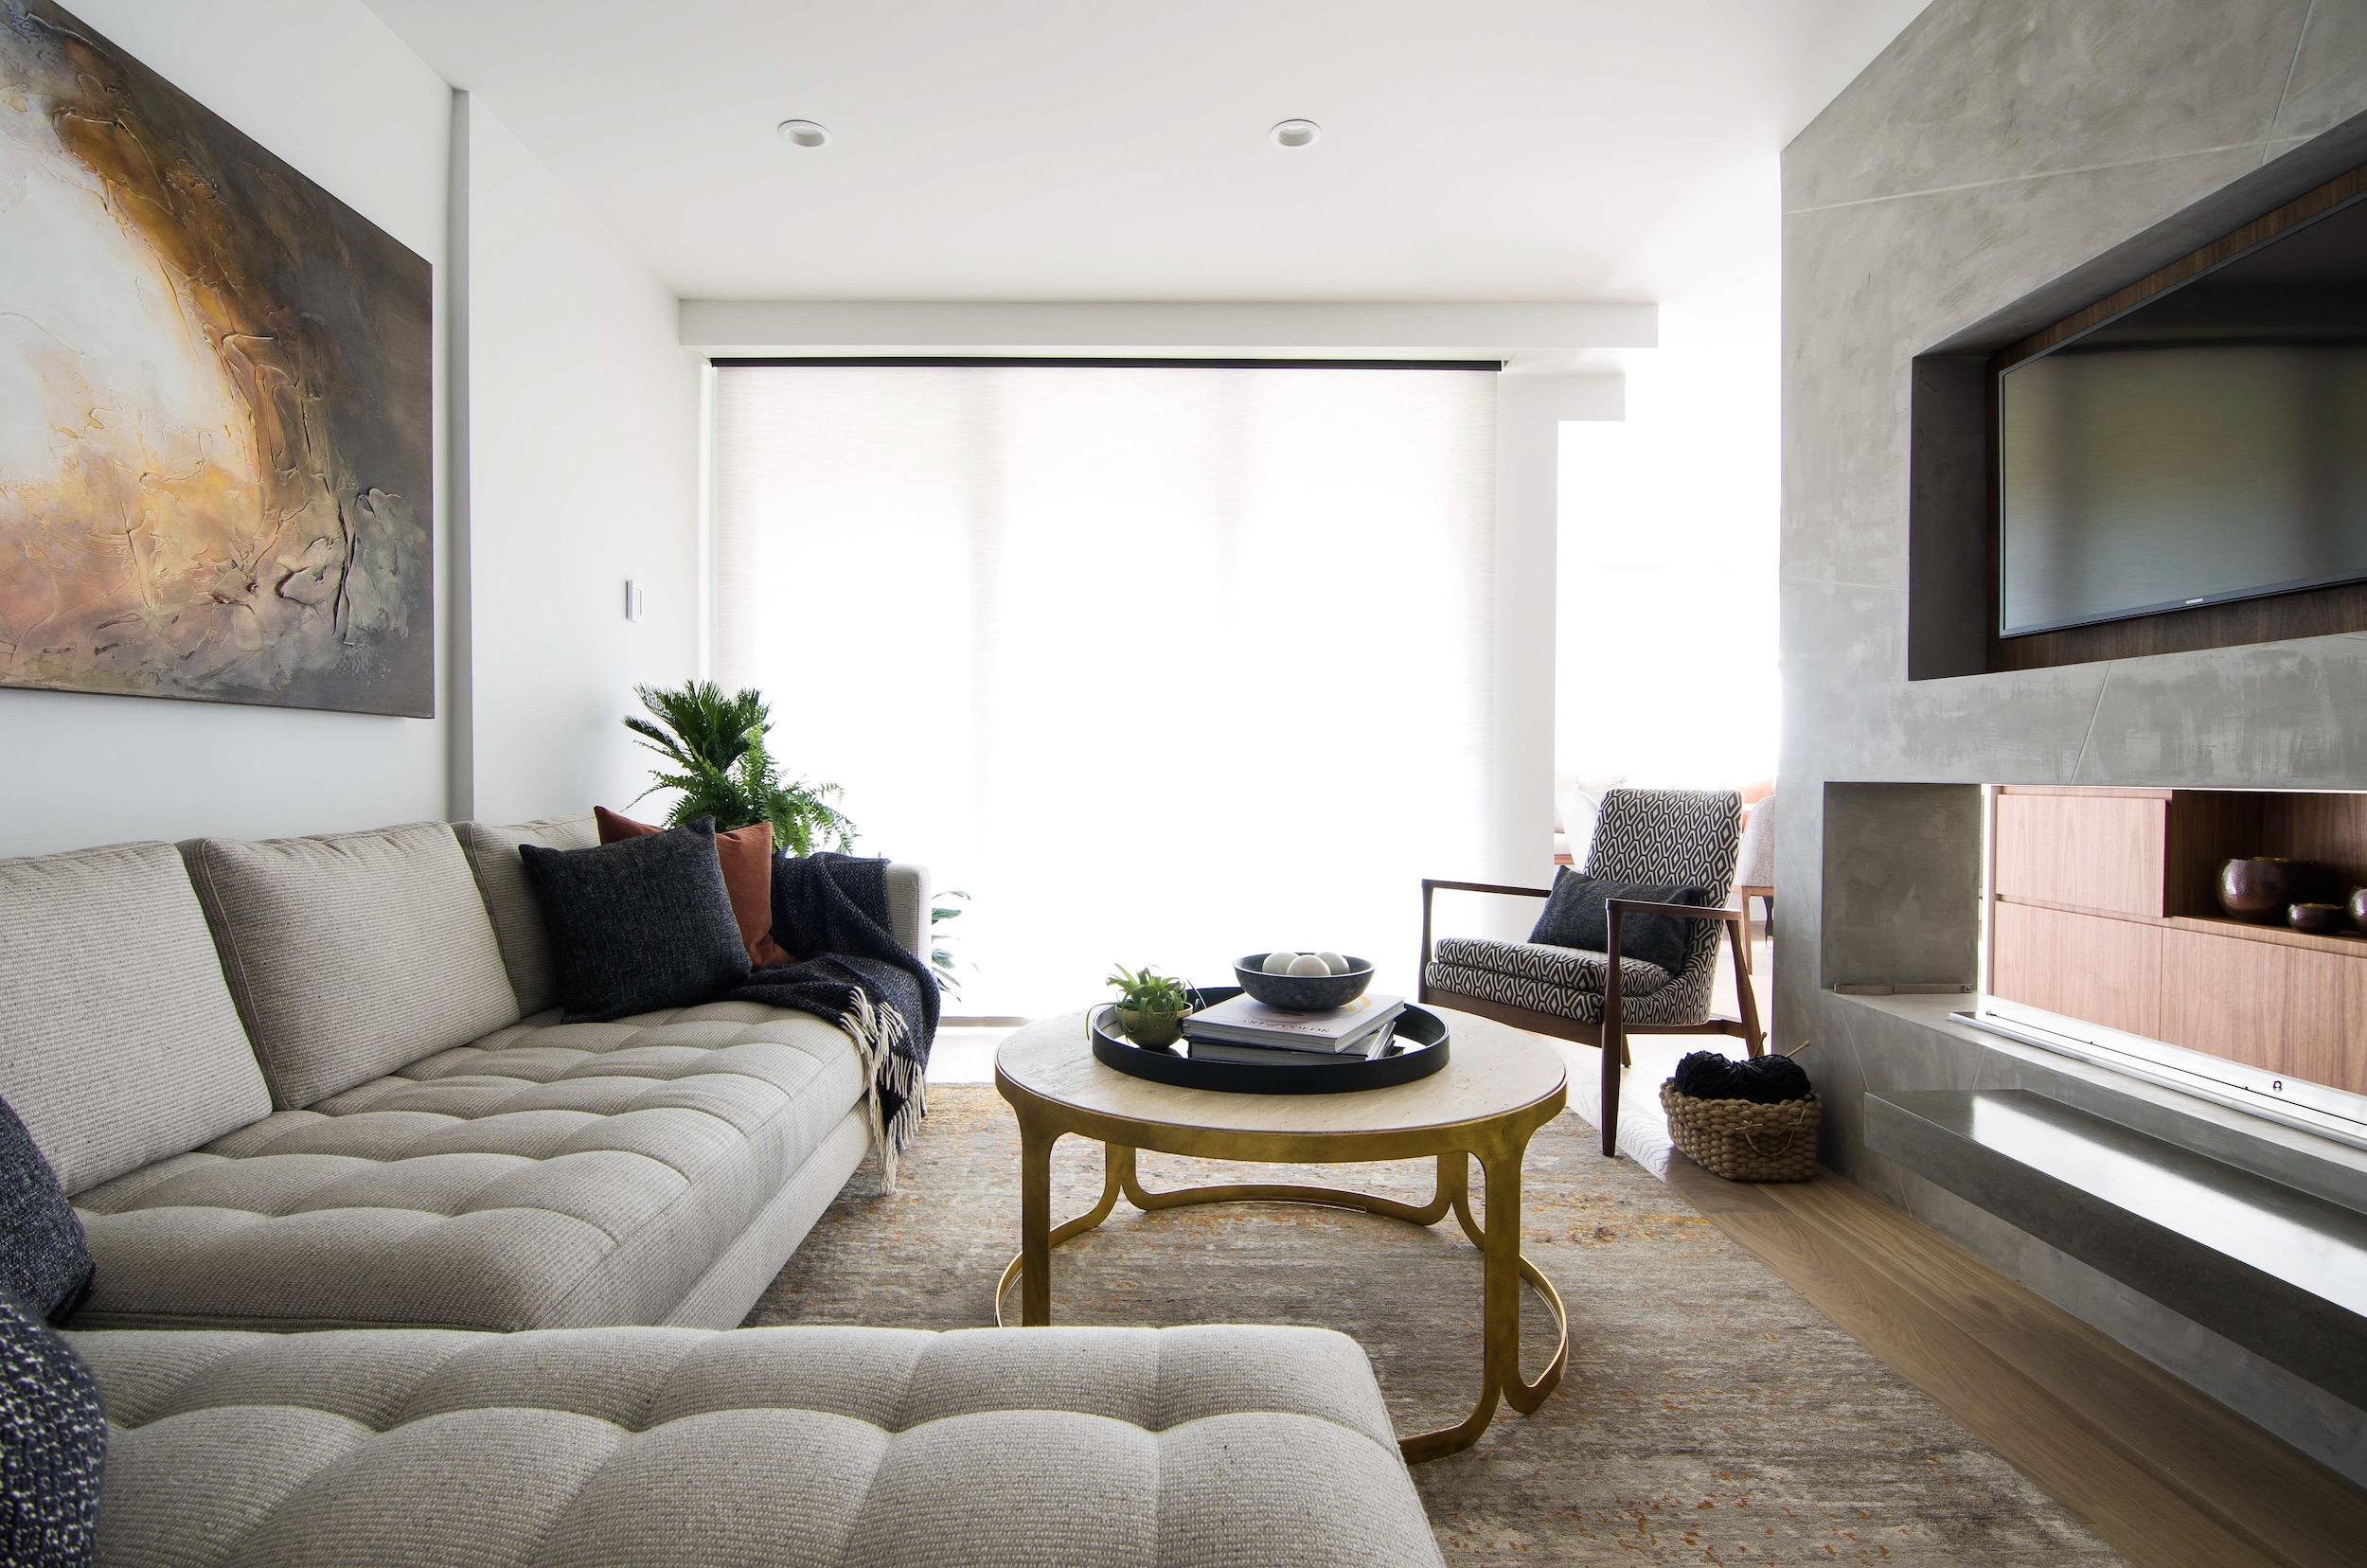 KRC_Spyglass_Living_Room.JPG.JPG